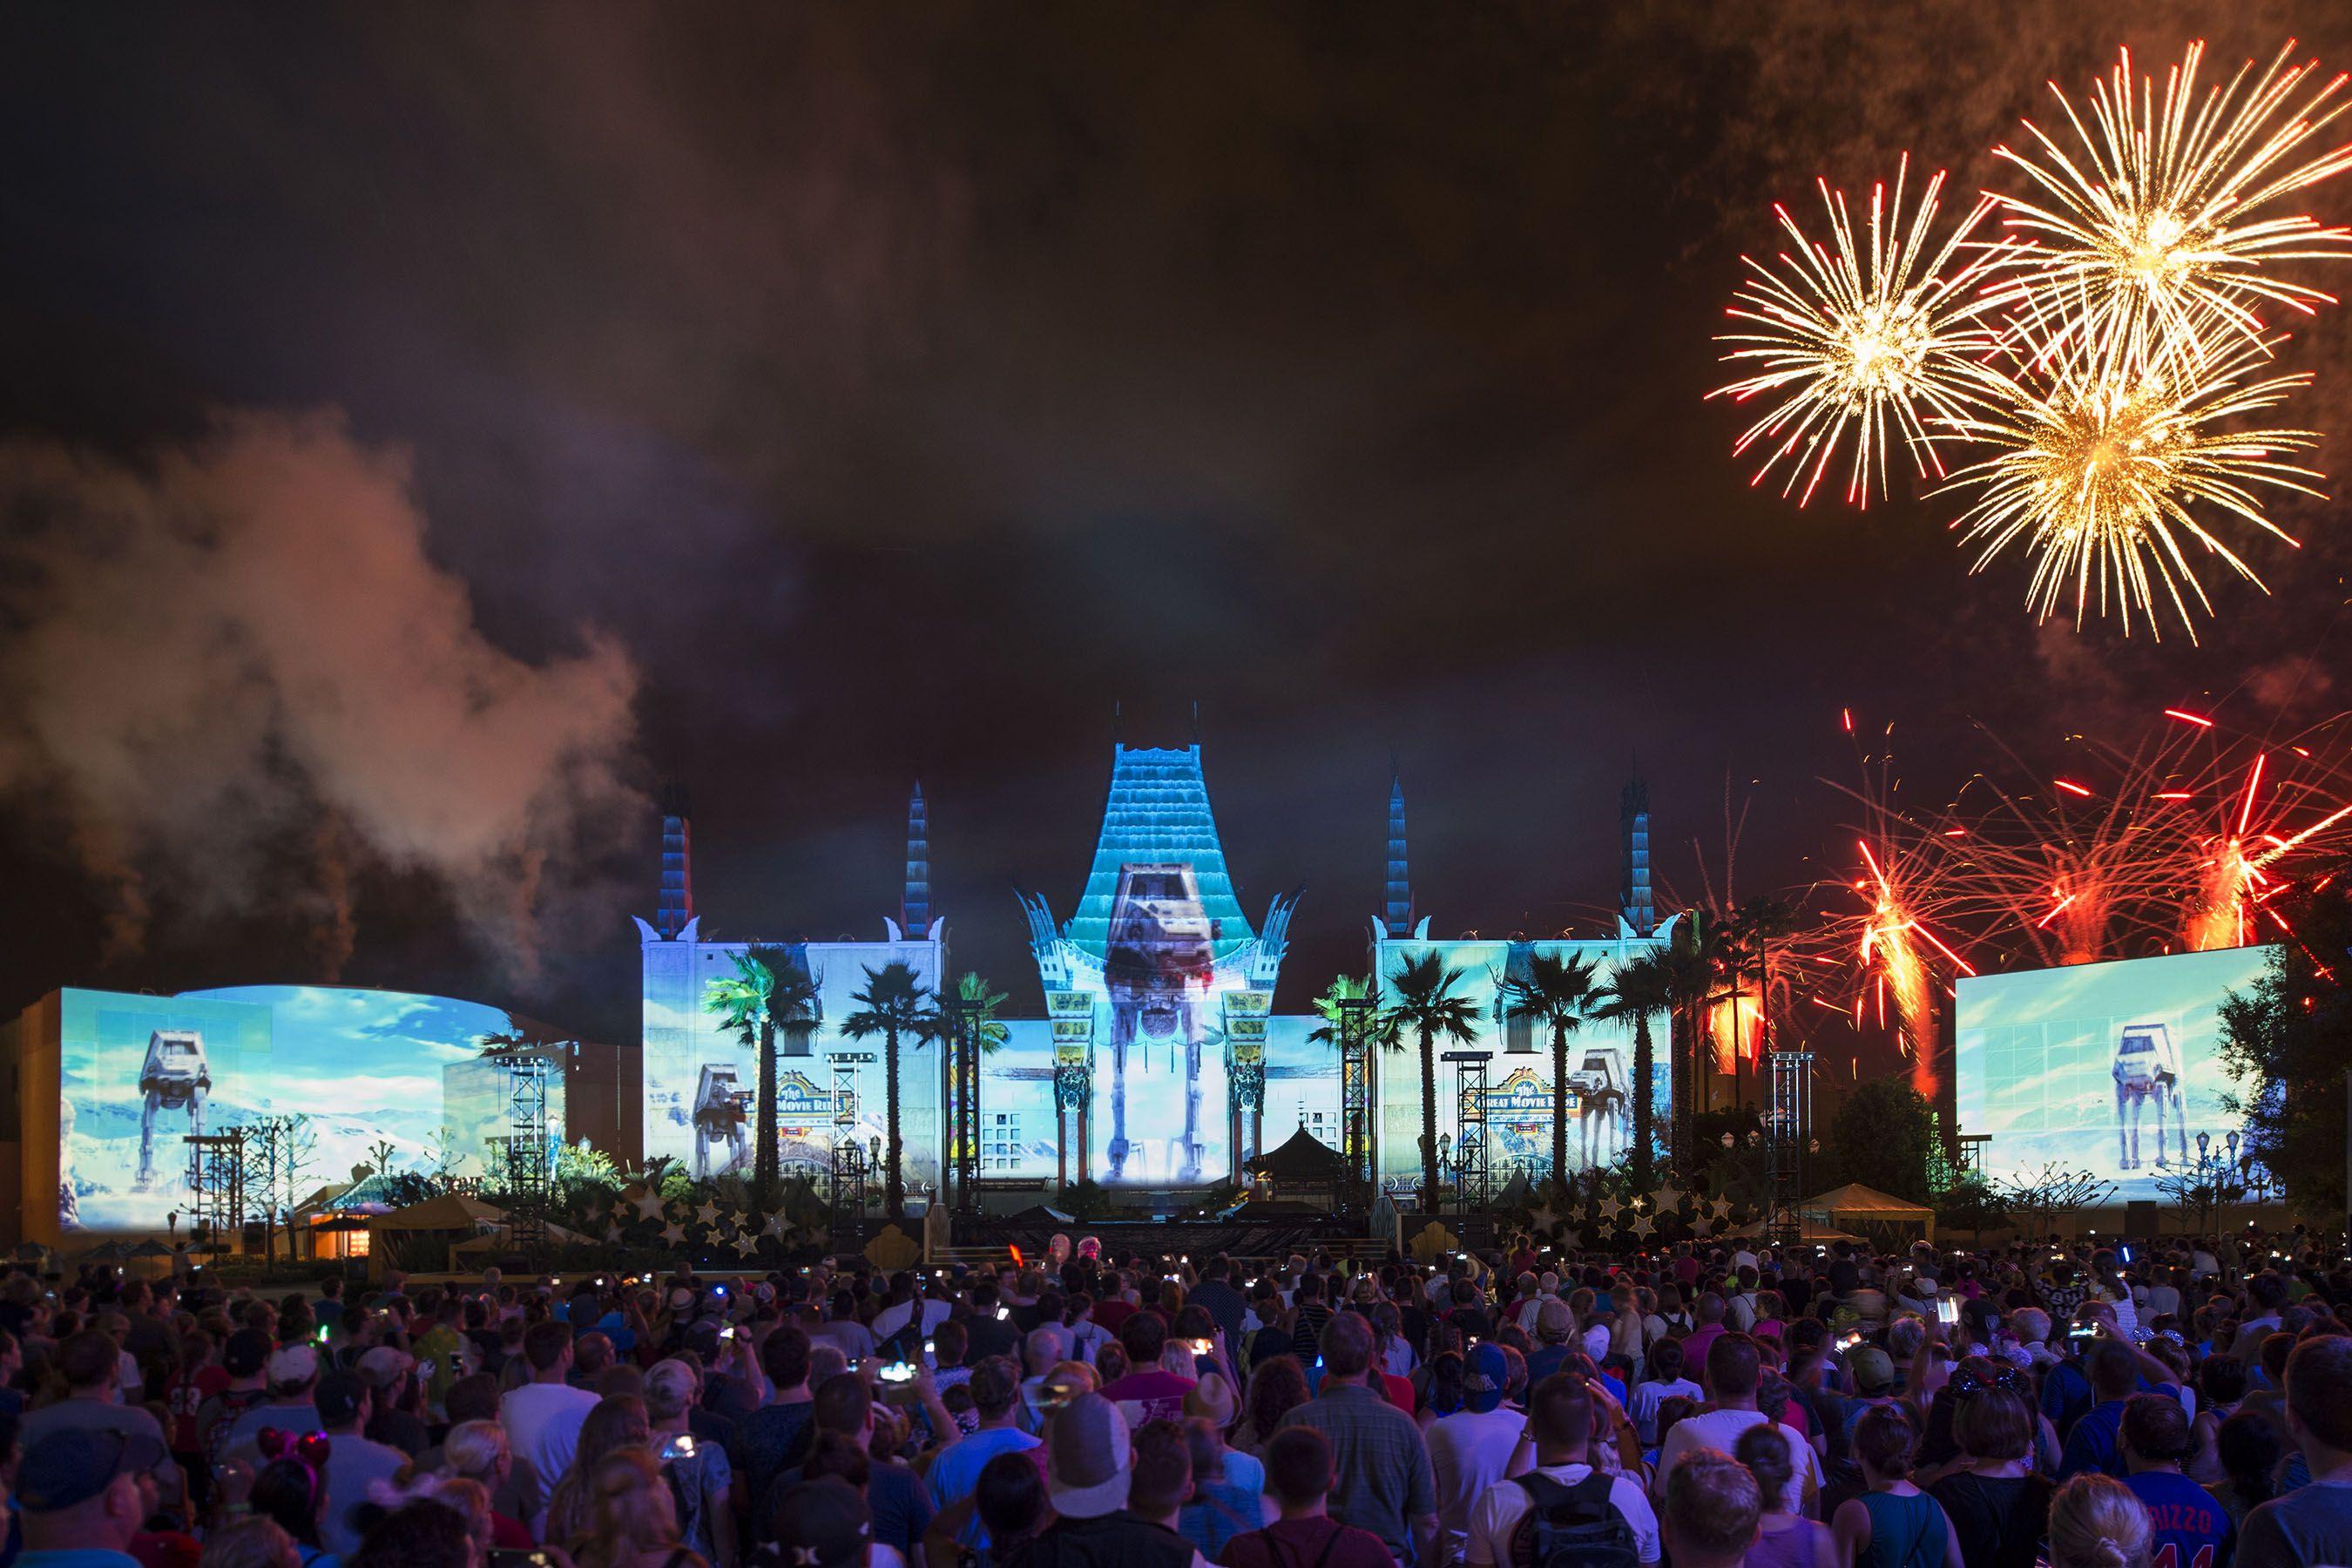 Star Wars A Galactic Spectacular at Walt Disney World